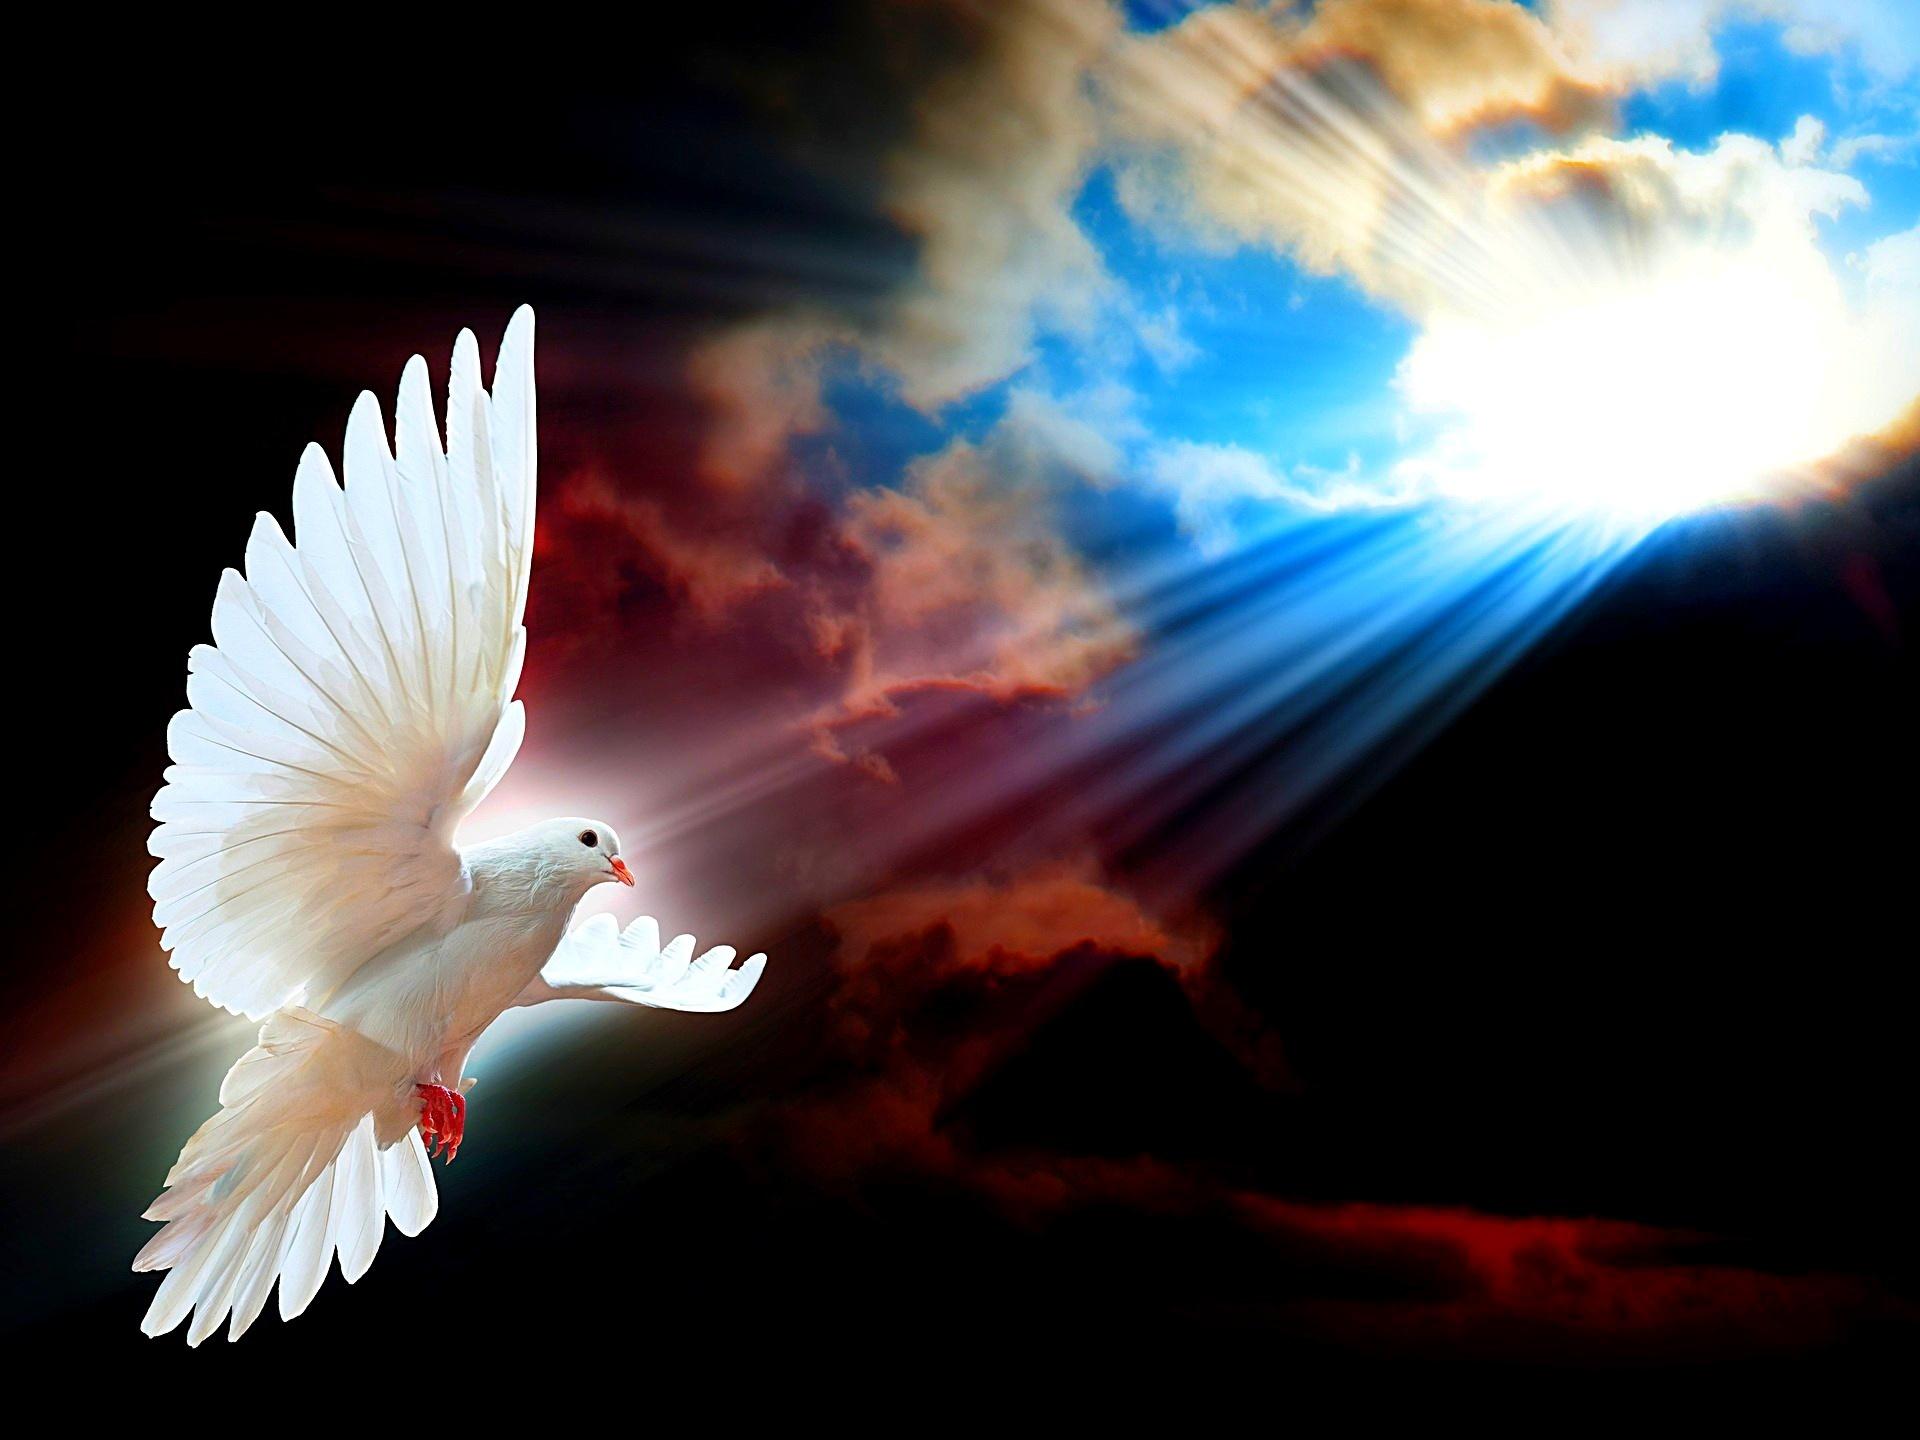 Христианские картинки на тему свет